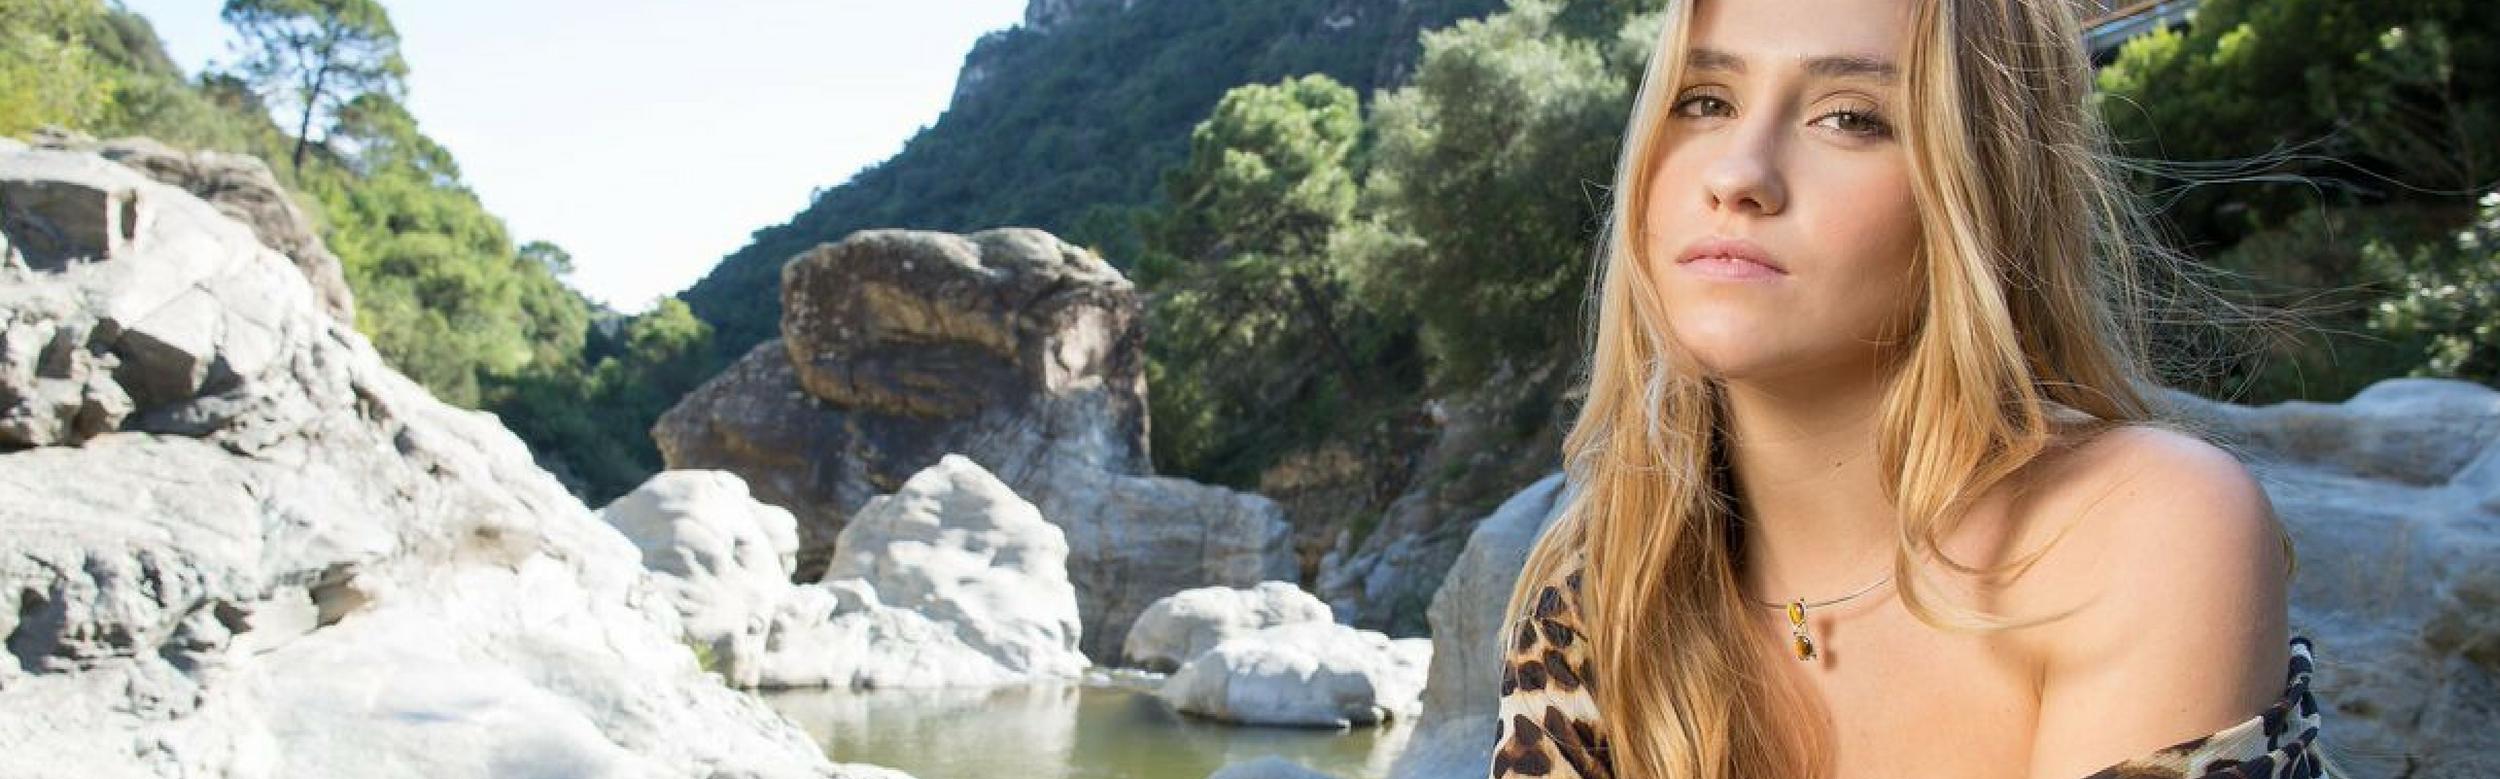 Piedras preciosas-Ojo de tigre-NEHCAA Jewelry